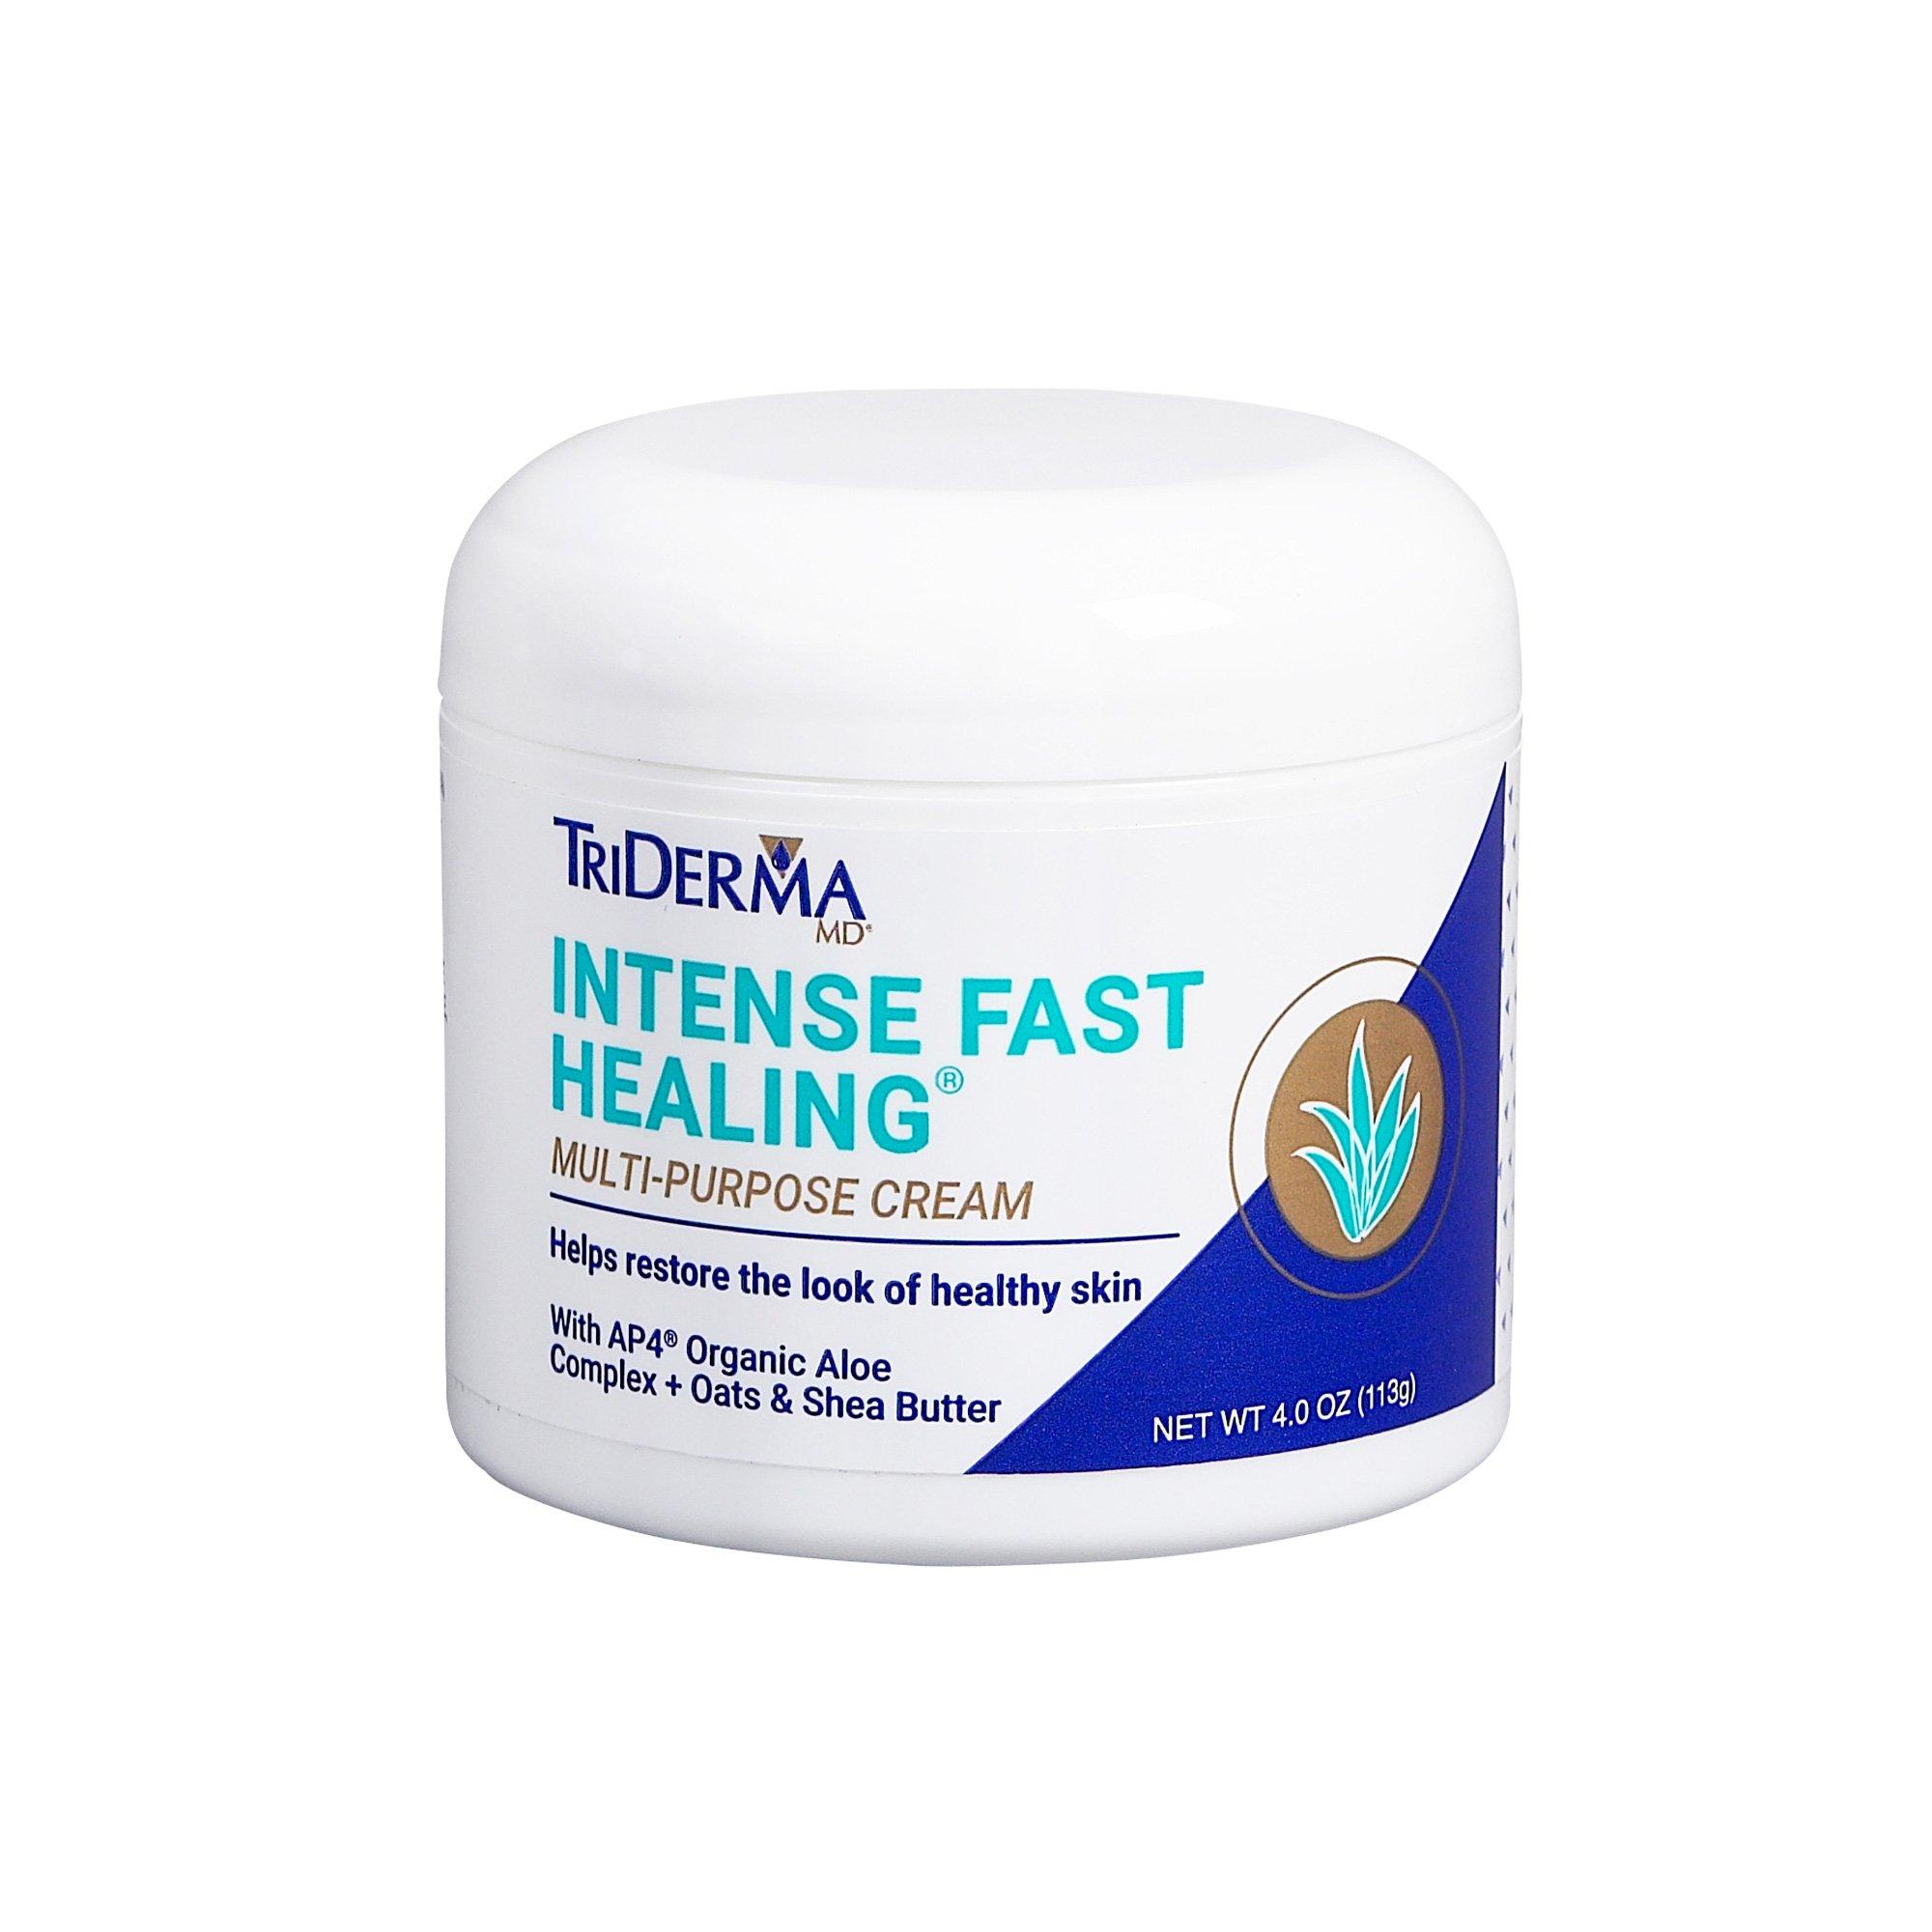 Intense Fast Healing Cream, 4 oz. by TriDerma